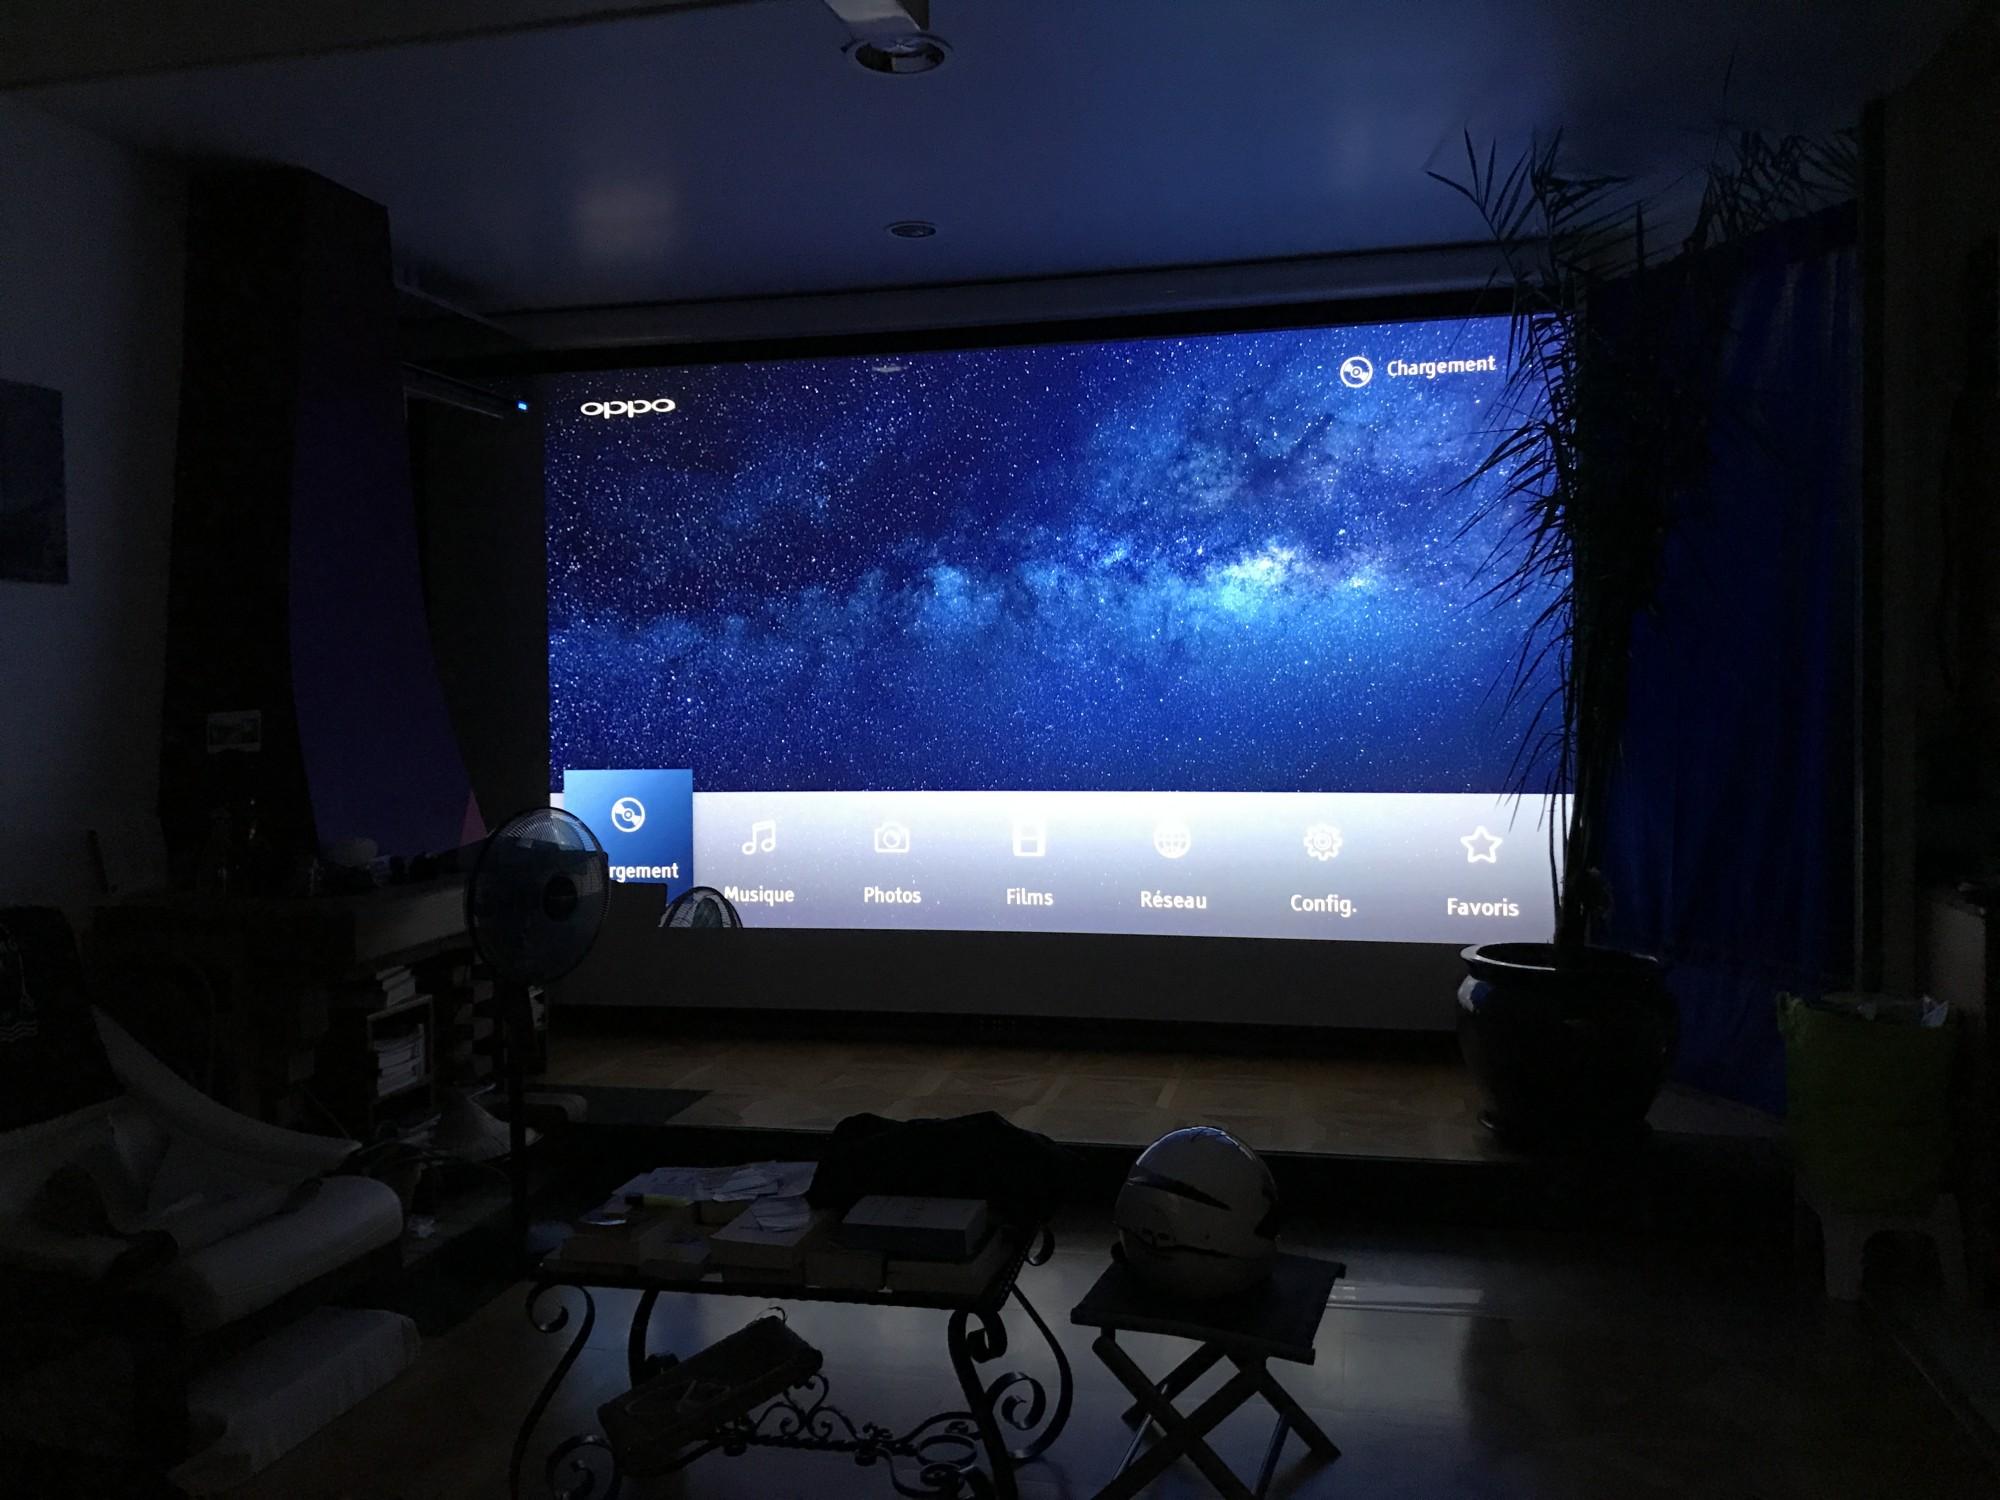 Sony VPL-VW5000ES videoprojecteur Laser home cinema dans le Var (83)